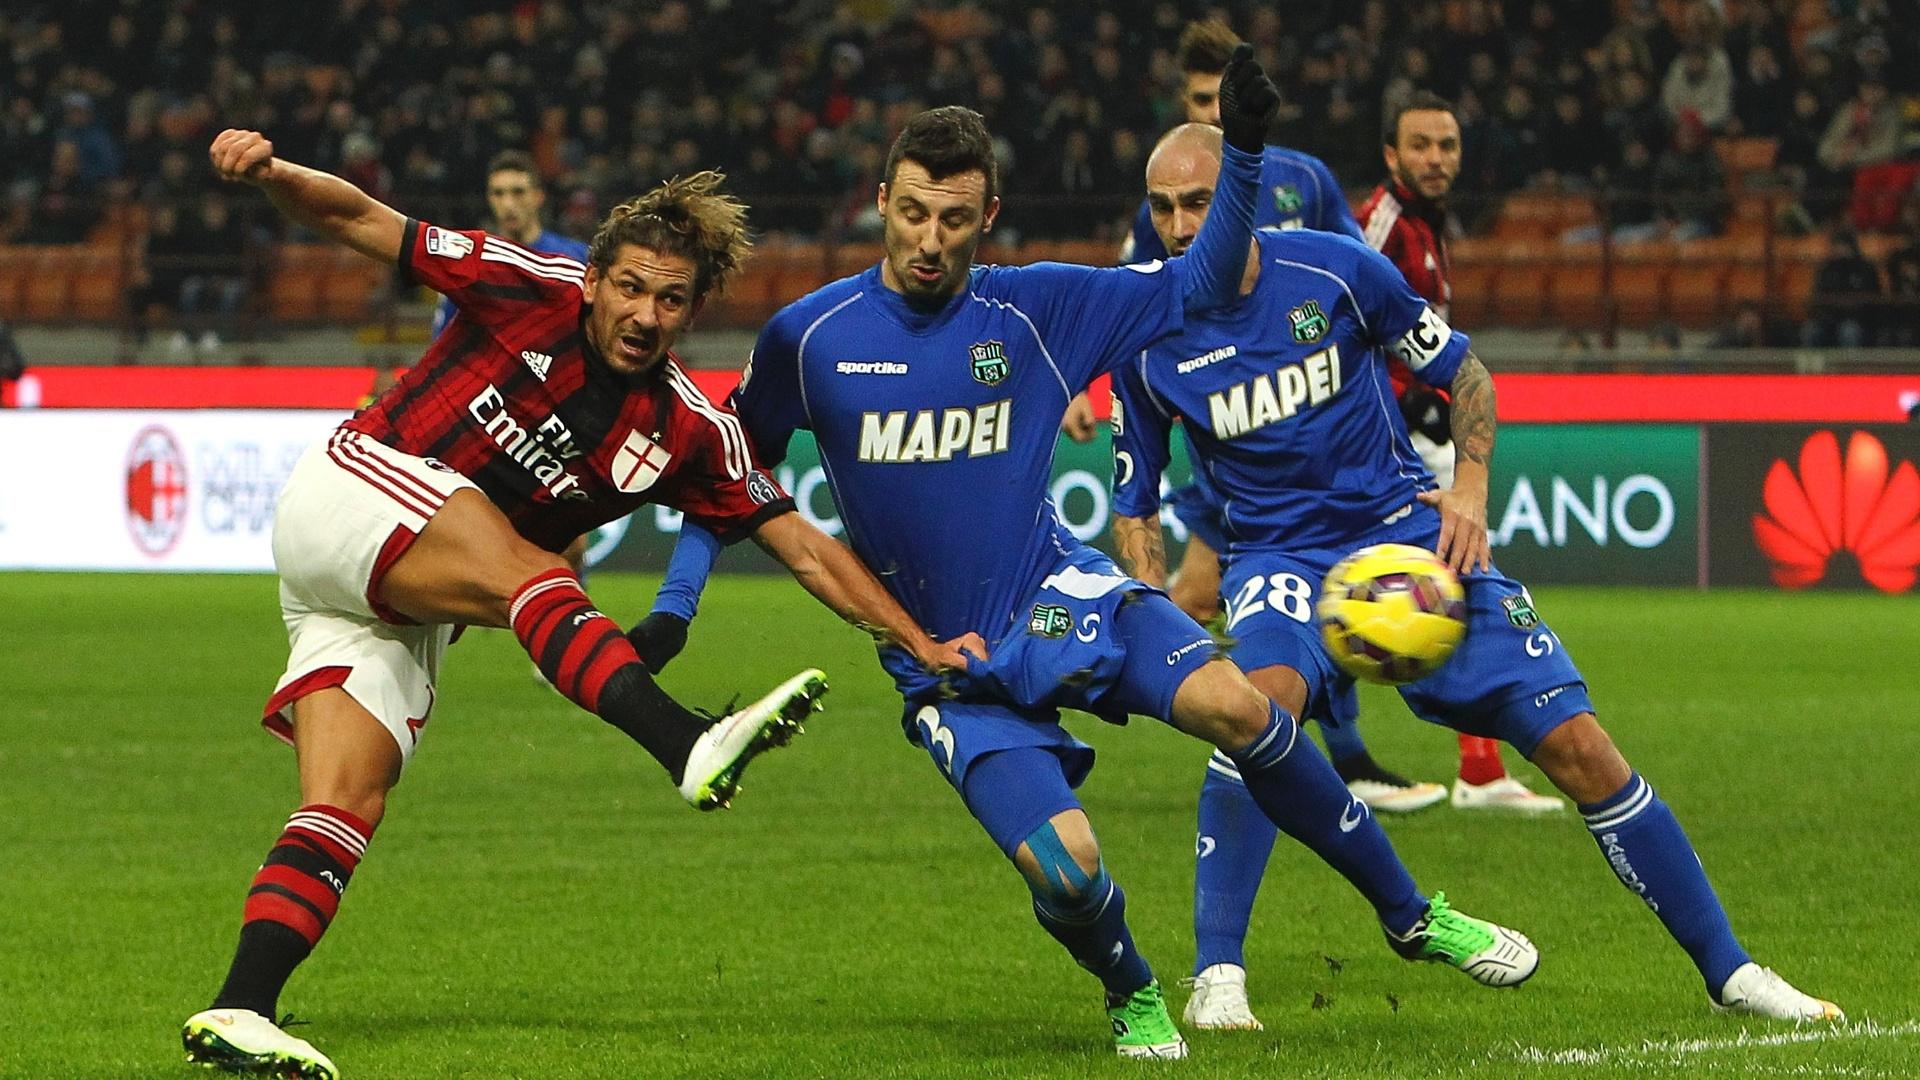 Alessandro Cerci, do Milan, chuta para a área durante o confronto contra o Sassuolo pela Copa da Itália